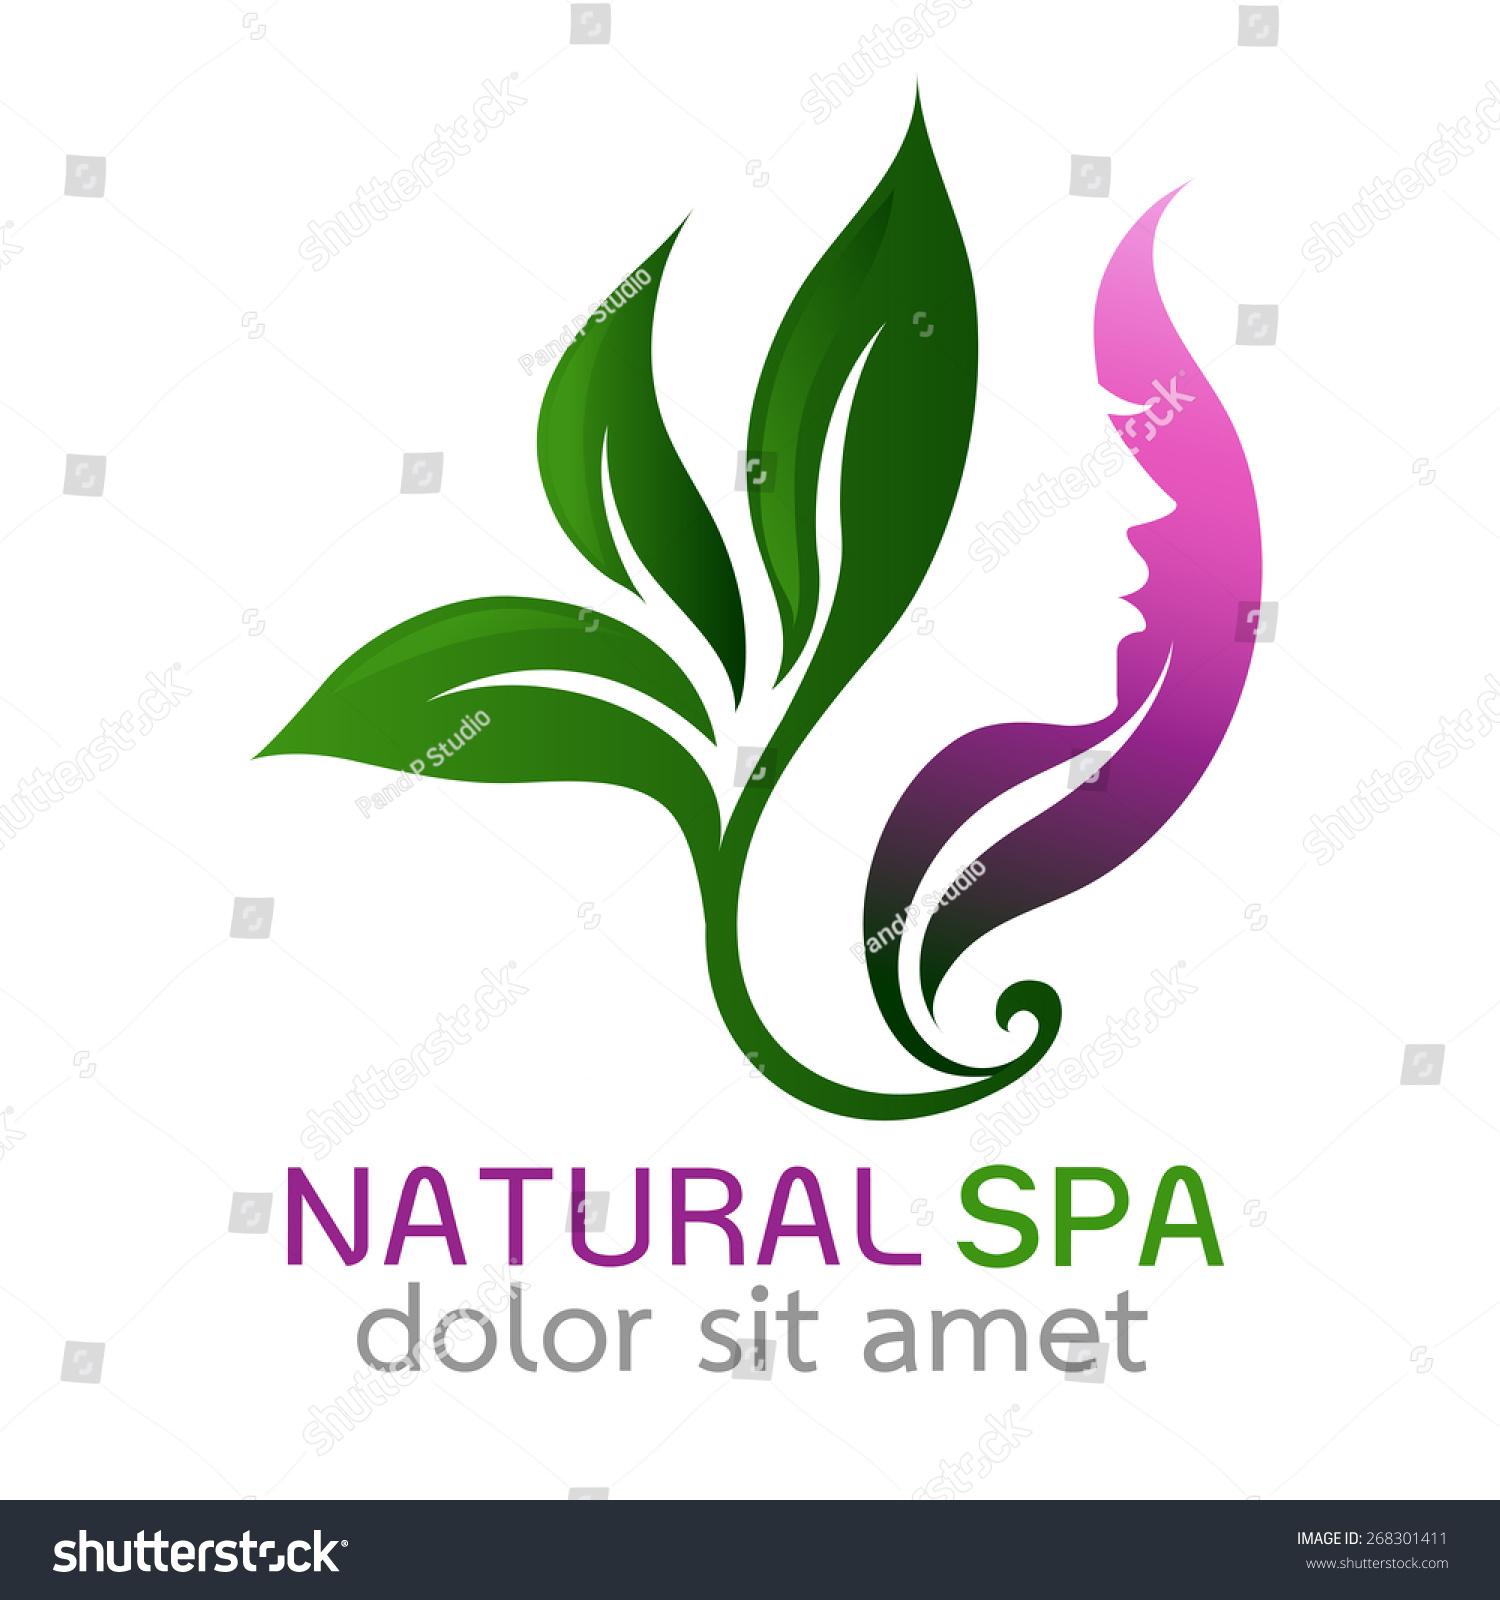 Beauty salon logo ideas vector images - Beauty design ...